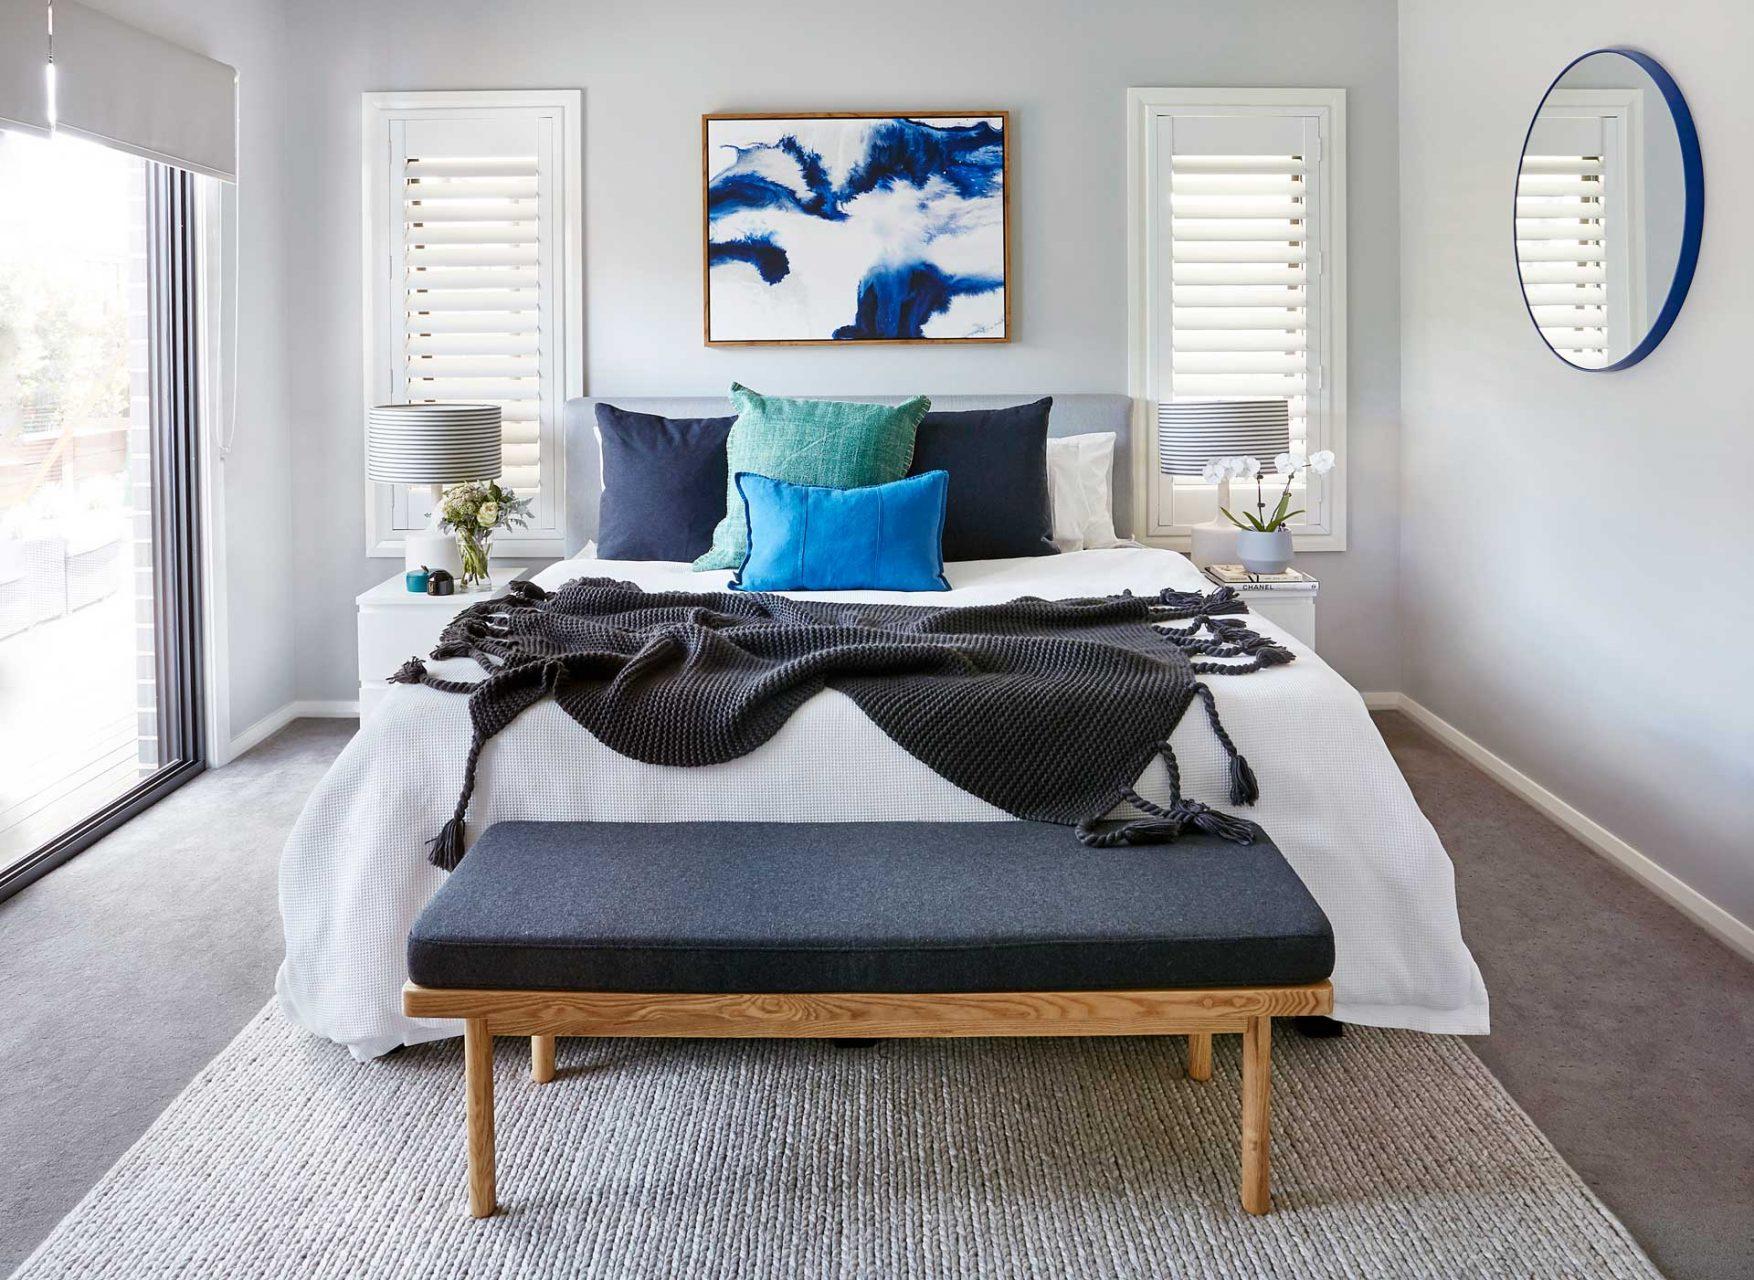 bedroom interior photography